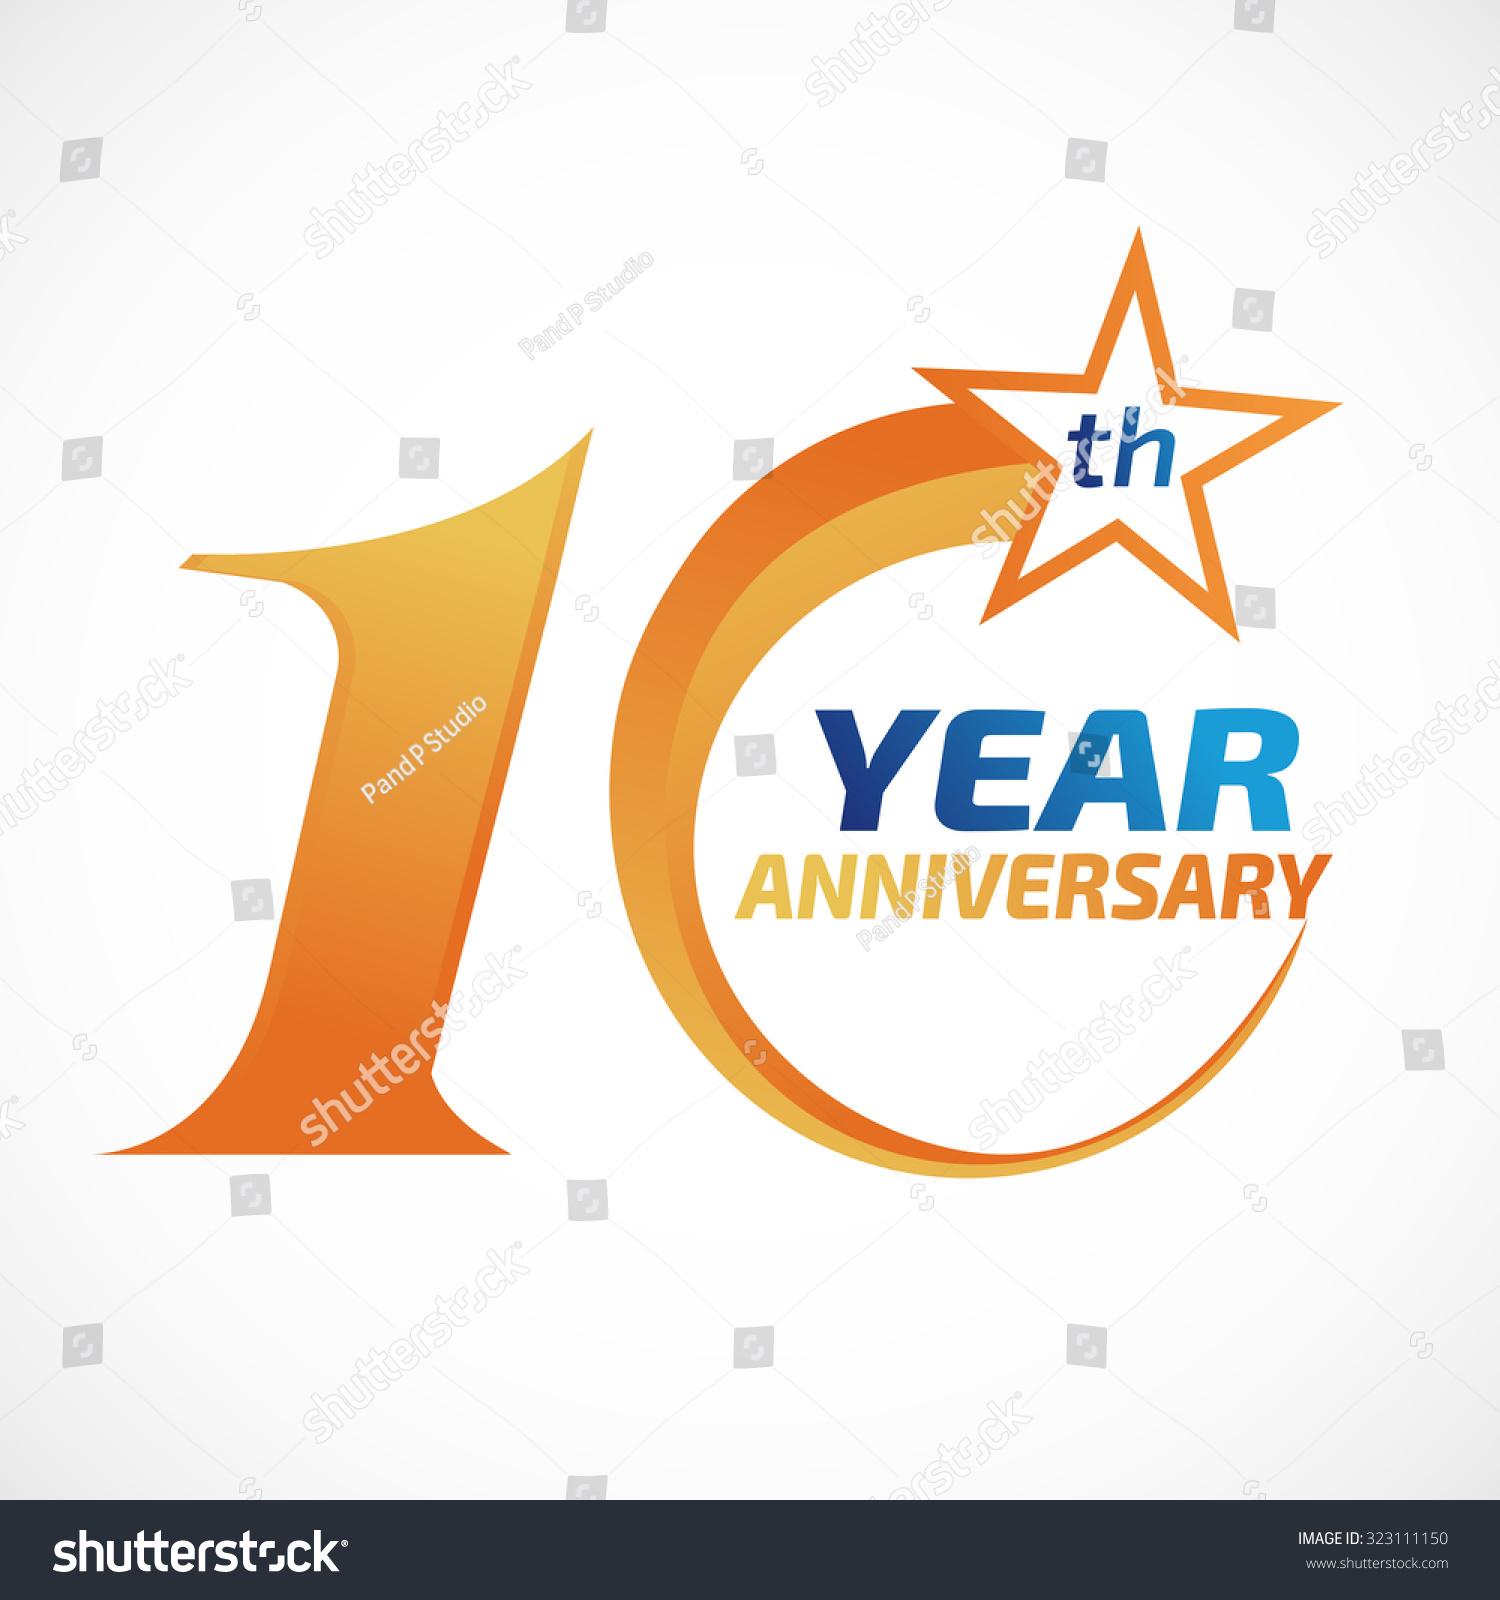 10 years anniversary template logo のベクター画像素材 ロイヤリティ